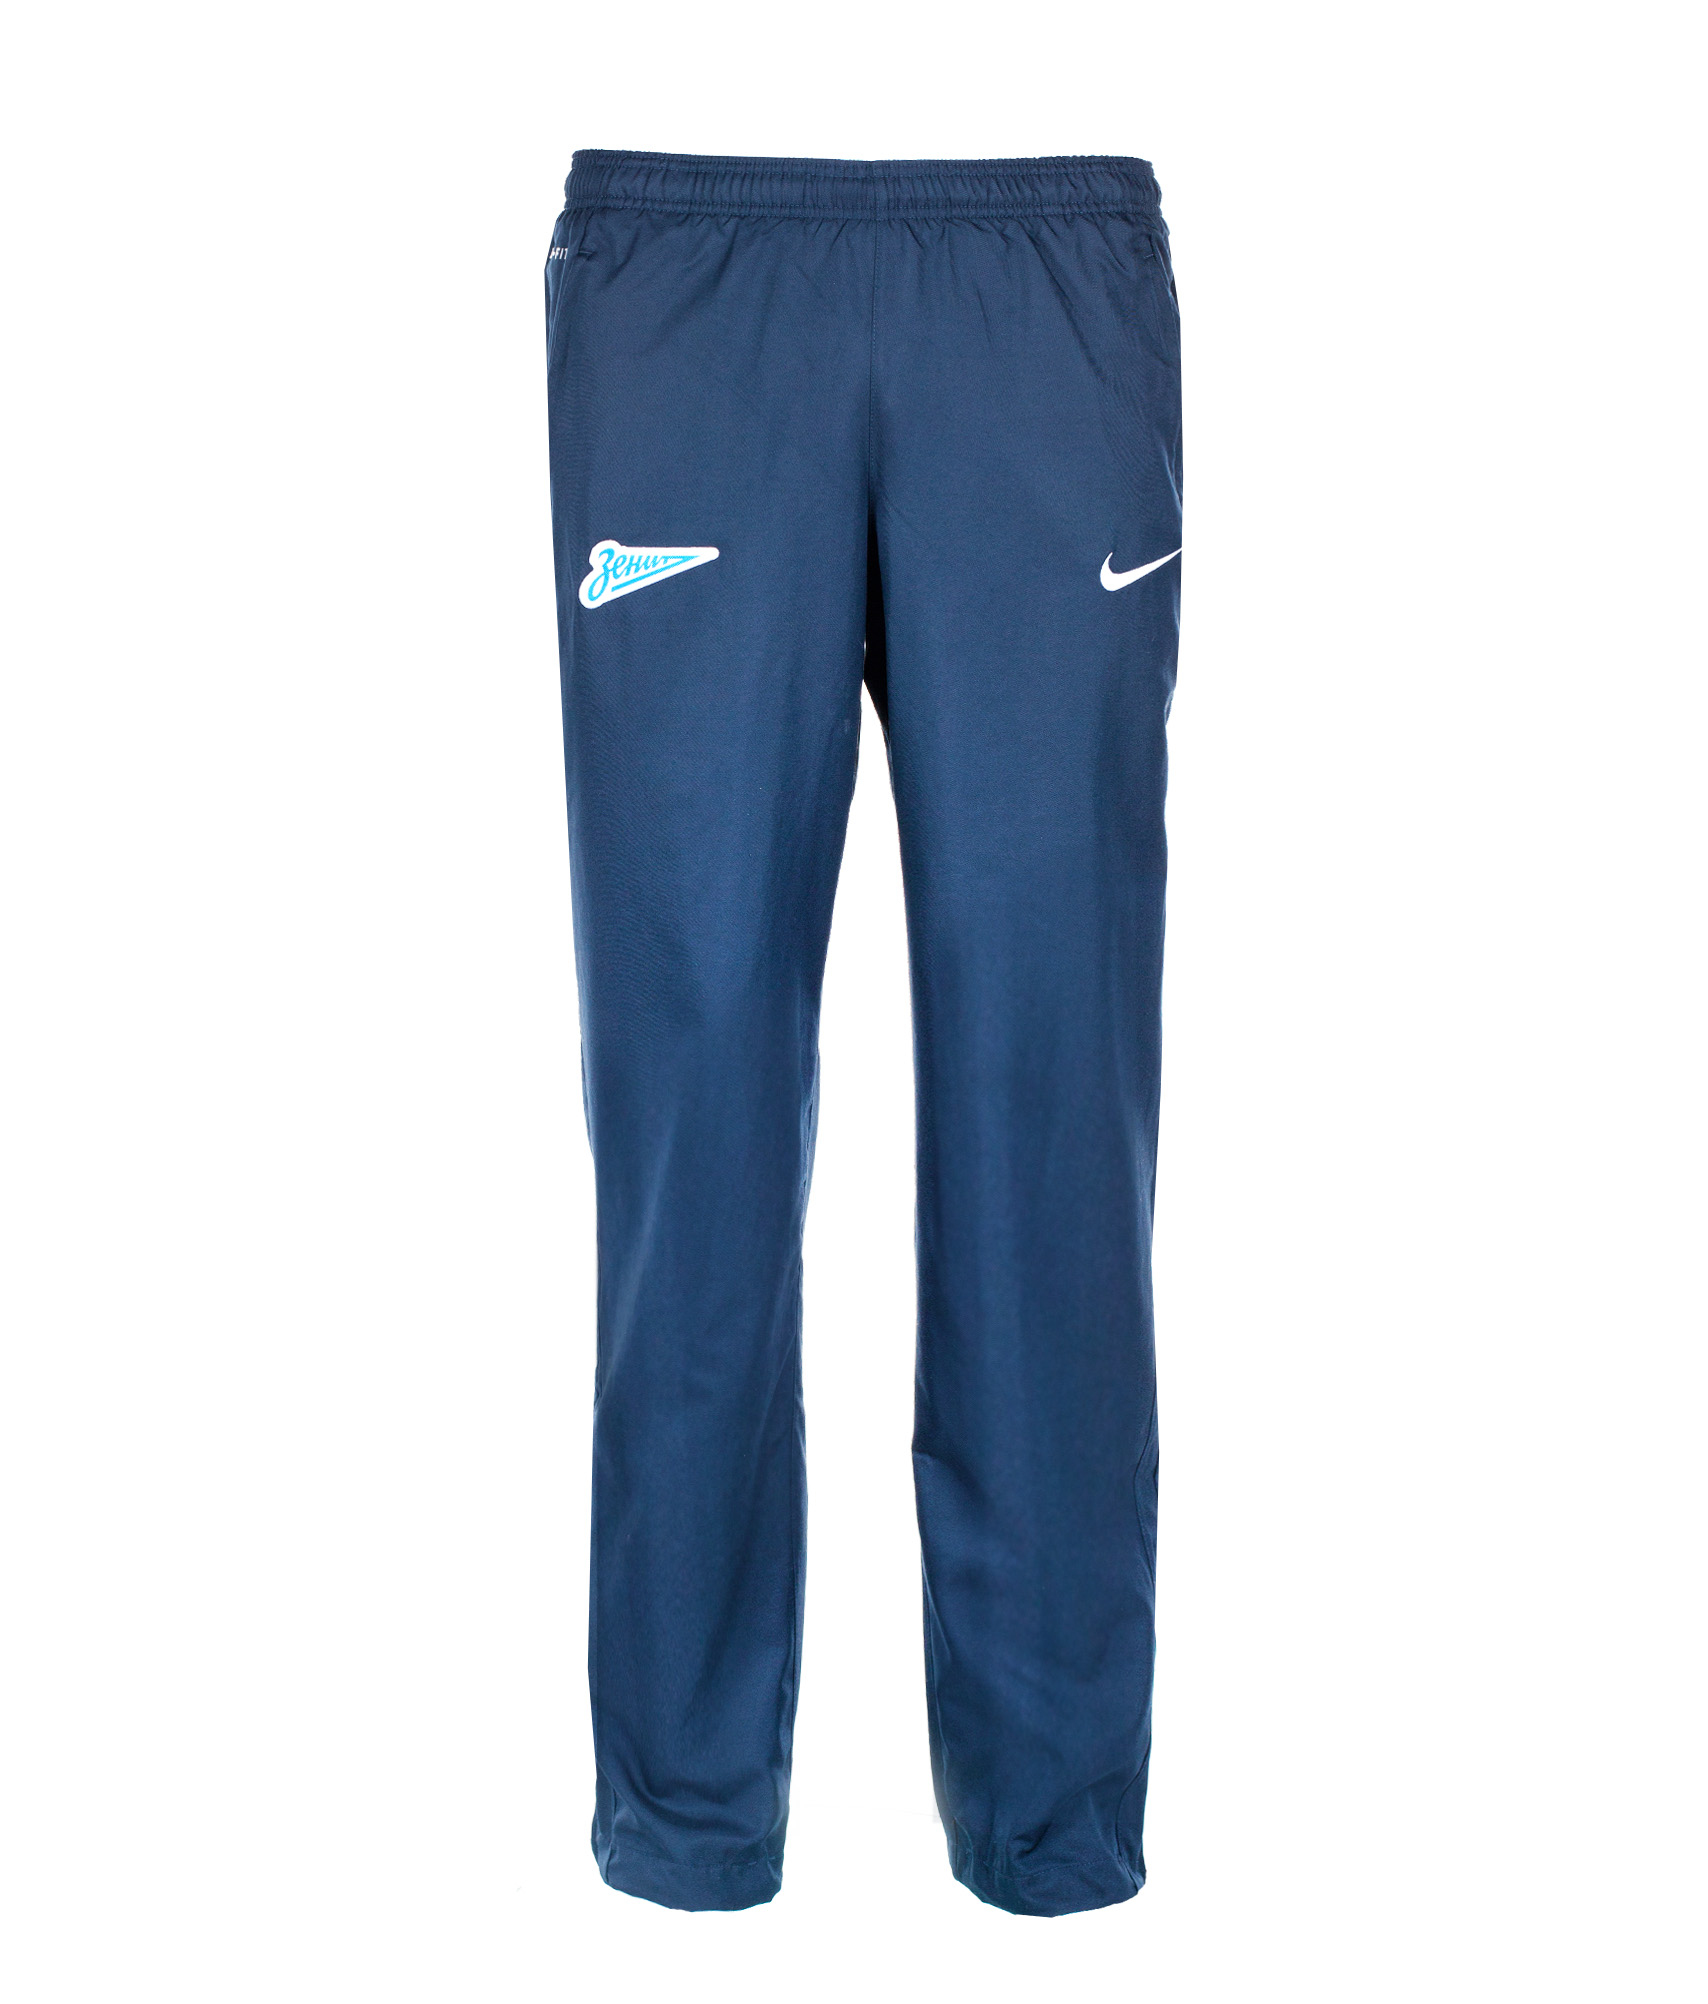 Брюки Nike Zenit Select Sdln WVN Pant, Цвет-Синий, Размер-L